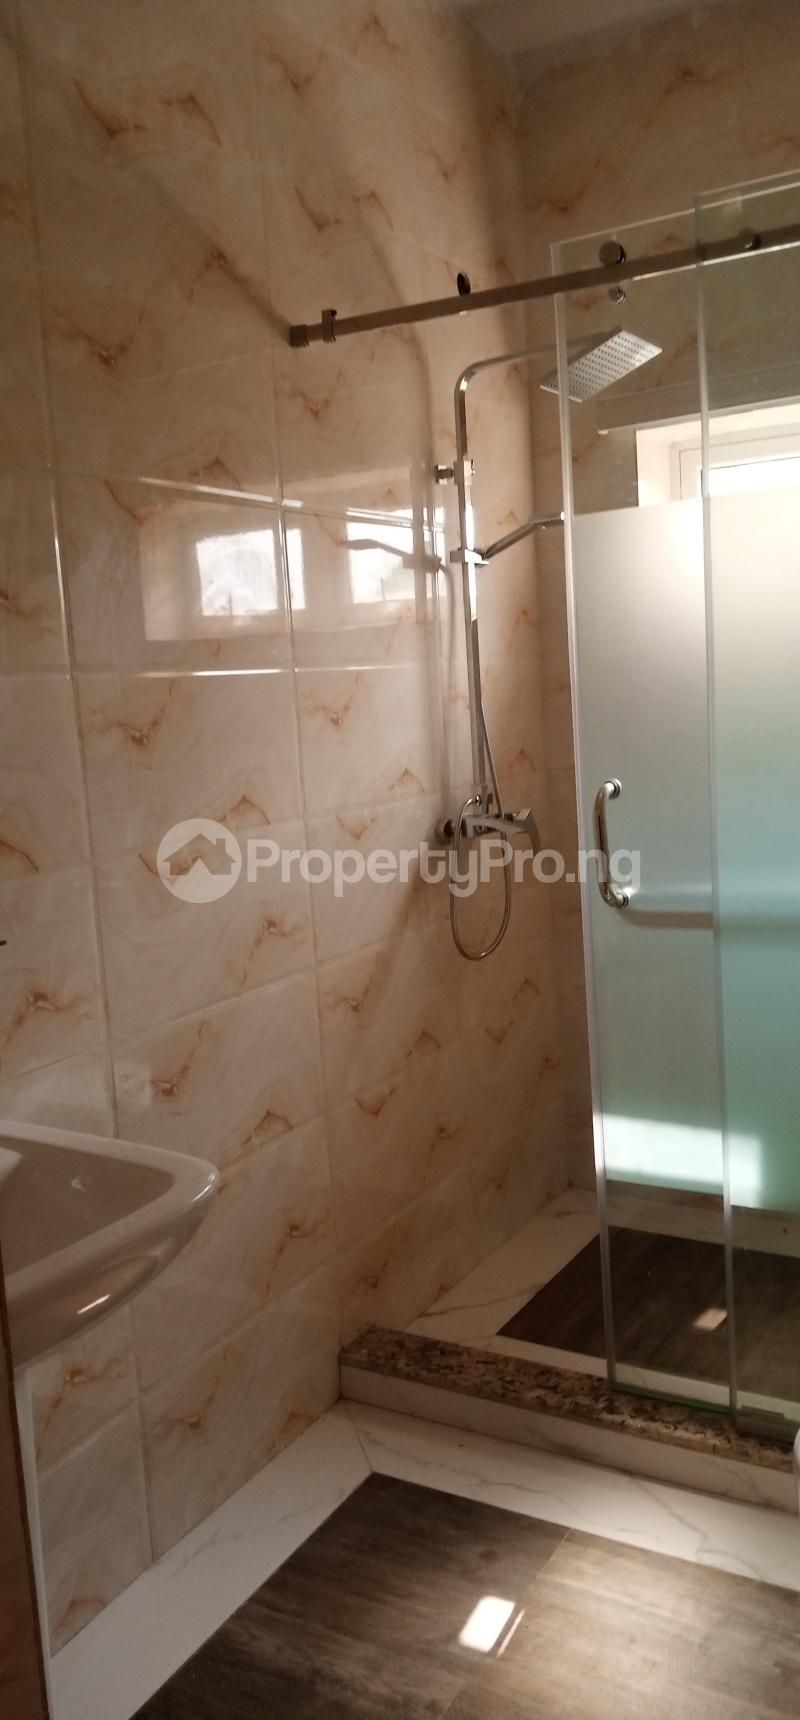 4 bedroom Terraced Duplex House for sale Wuye Abuja - 8